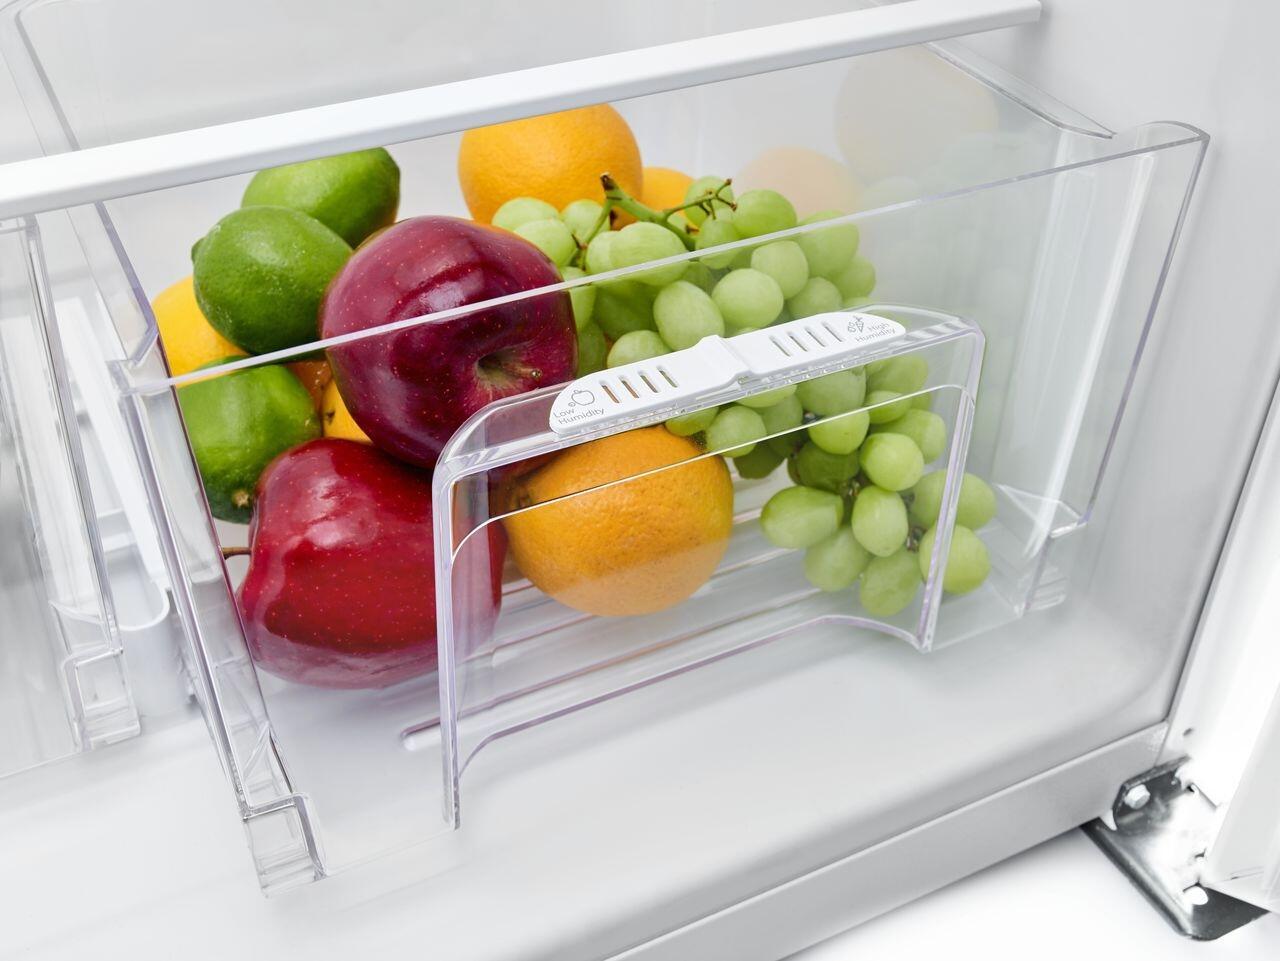 Amana Art318ffdw 30 Inch White Refrigerator With 182 Cu Ft Wiring Diagram On Oil Furnace Older Sample Installation 1 2 3